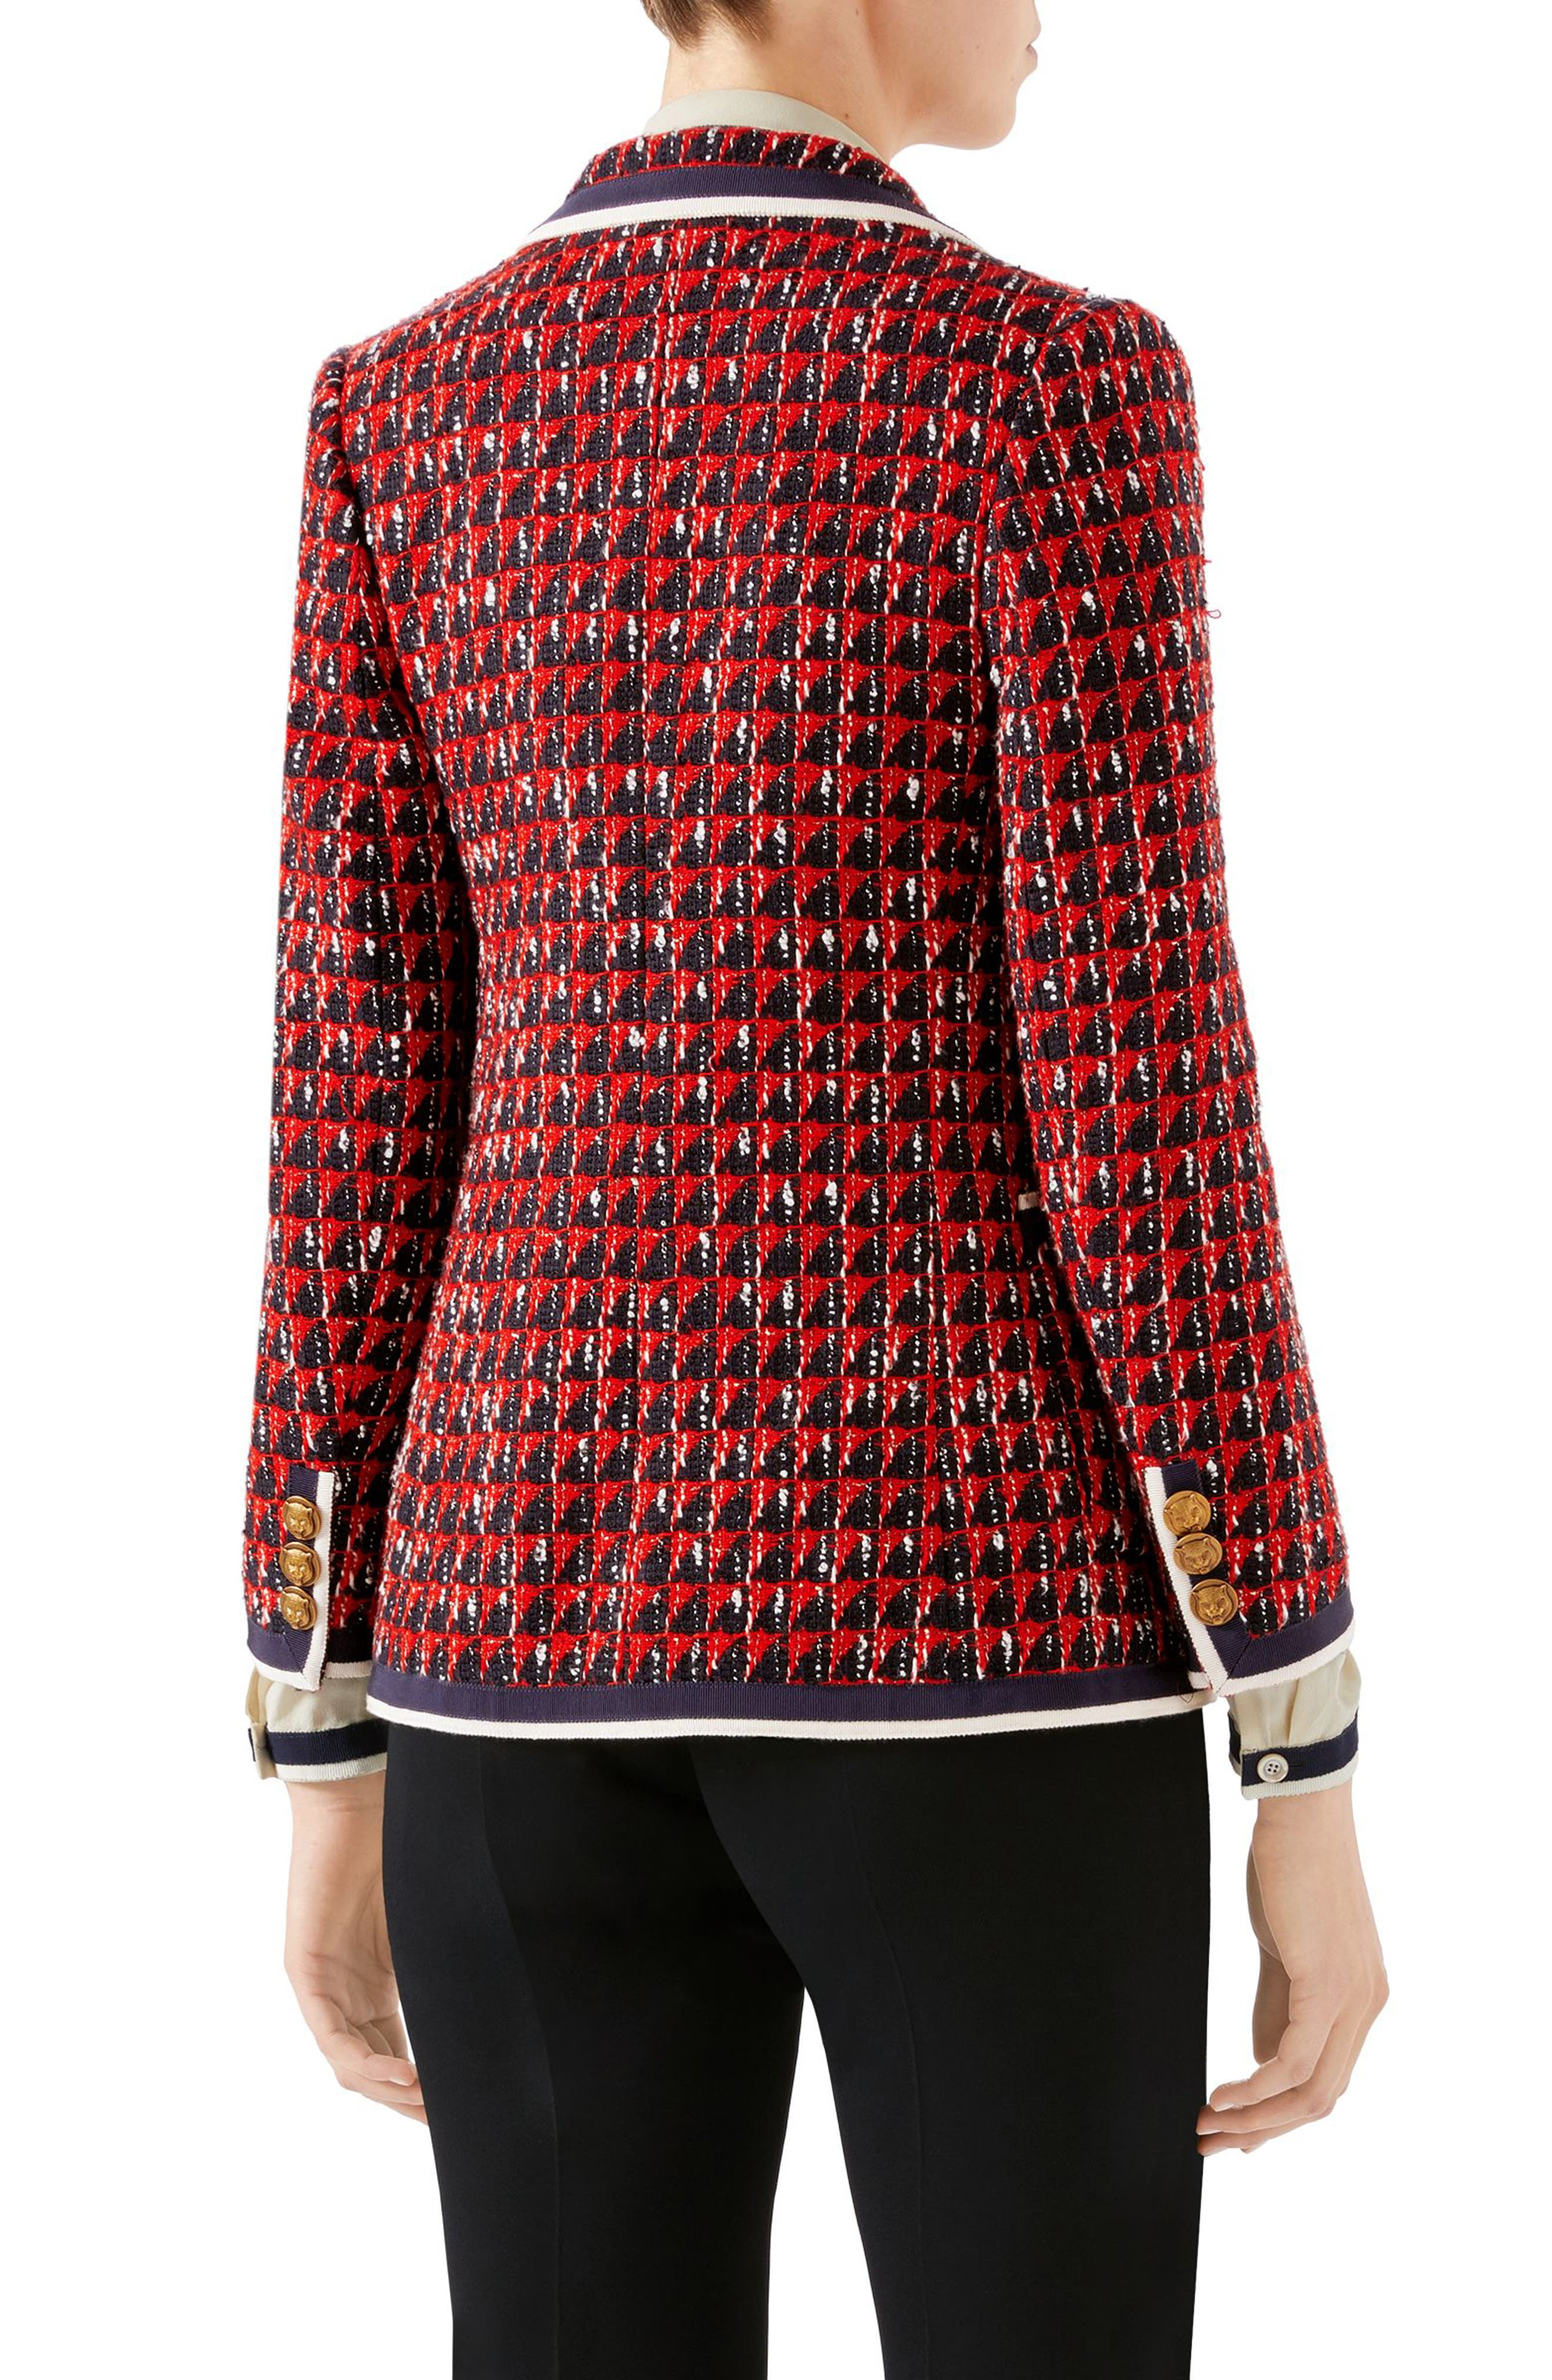 Geo Tweed Jacket,                             Alternate thumbnail 2, color,                             1880 BLACK/ RED/ WHITE